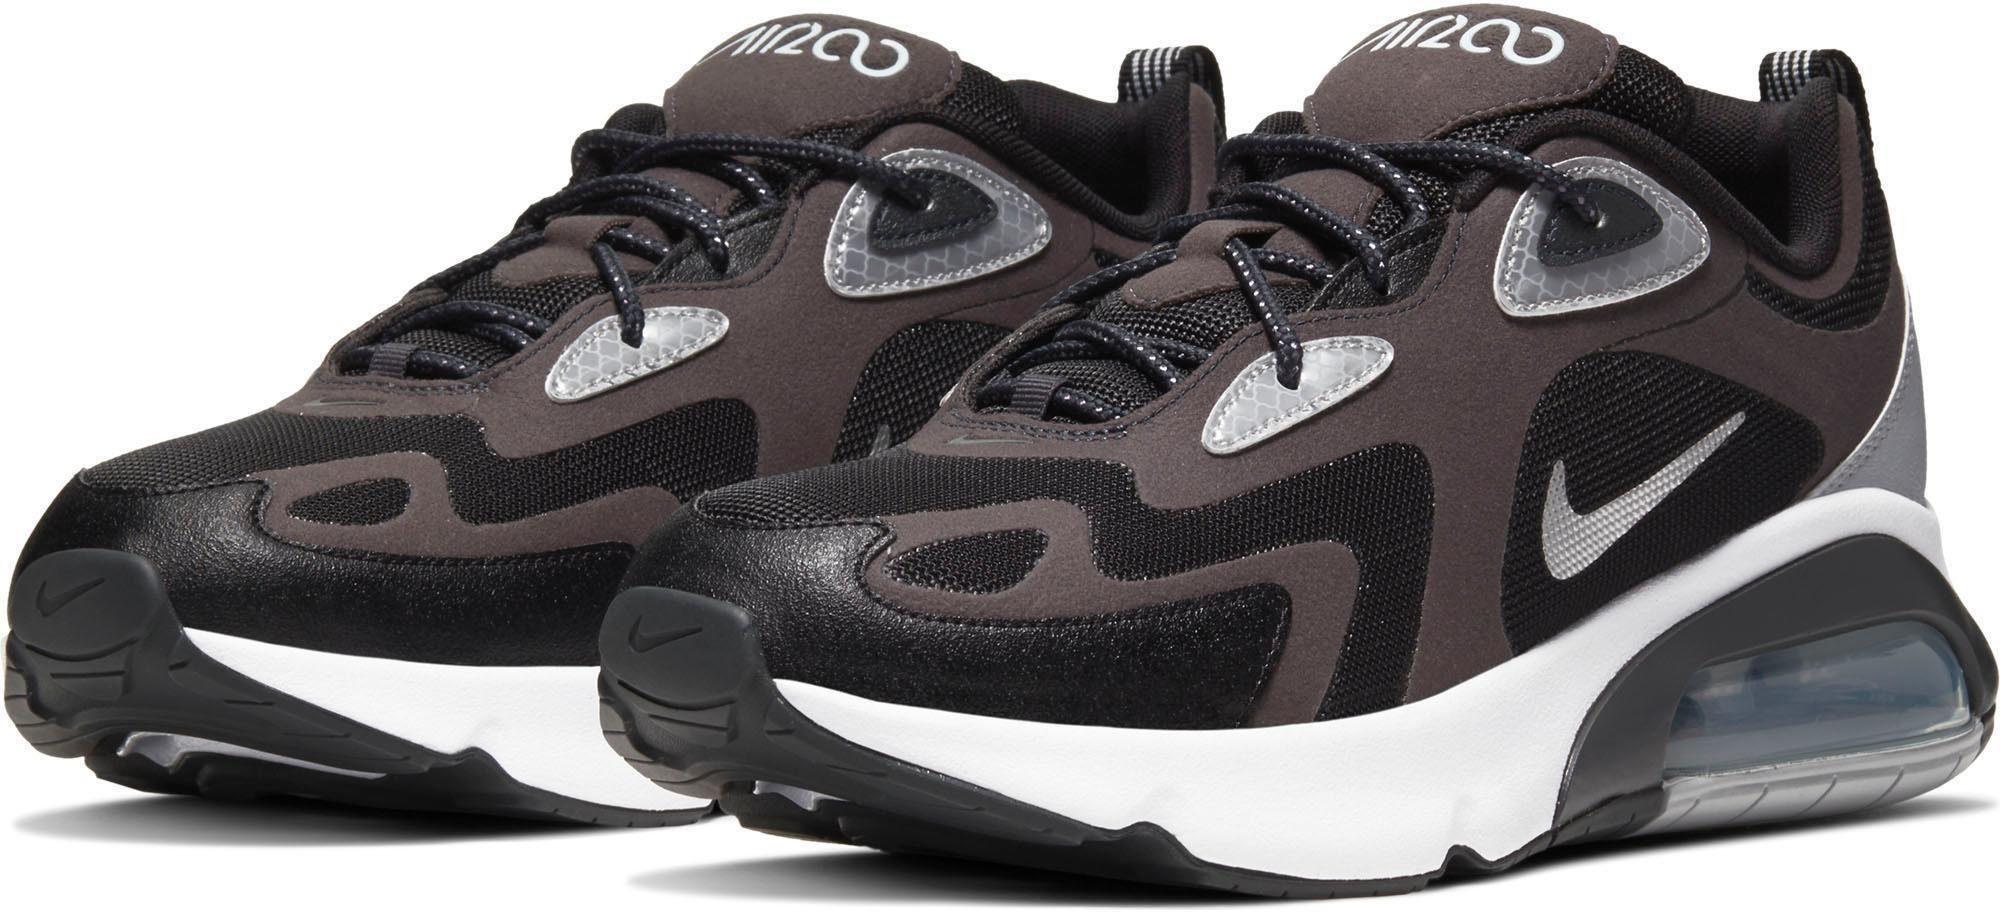 200 »Air SneakerOTTO Sportswear Max winterized« Nike 80XnOPkZNw